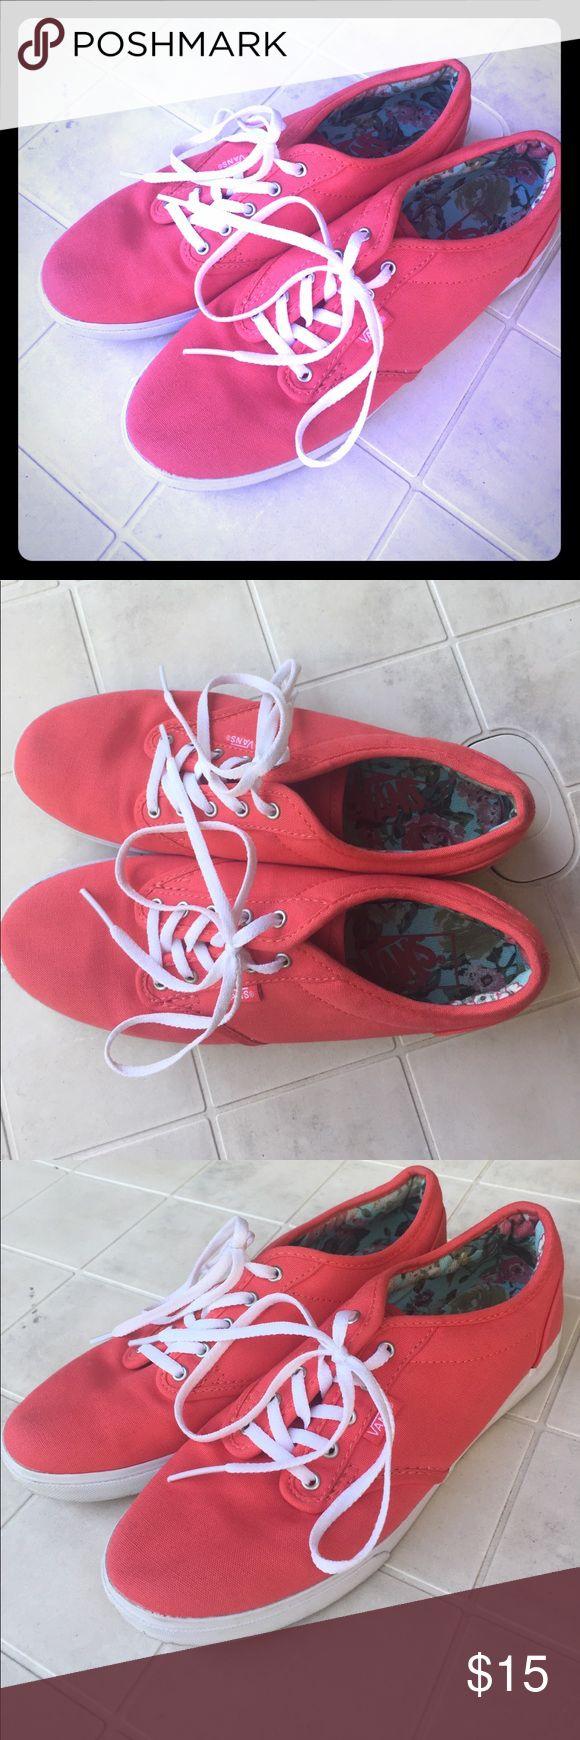 Coral Vans Sneakers Size 7.5 Coral covered Vans sneakers, barely worn. Smoke free pet free home. Vans Shoes Sneakers